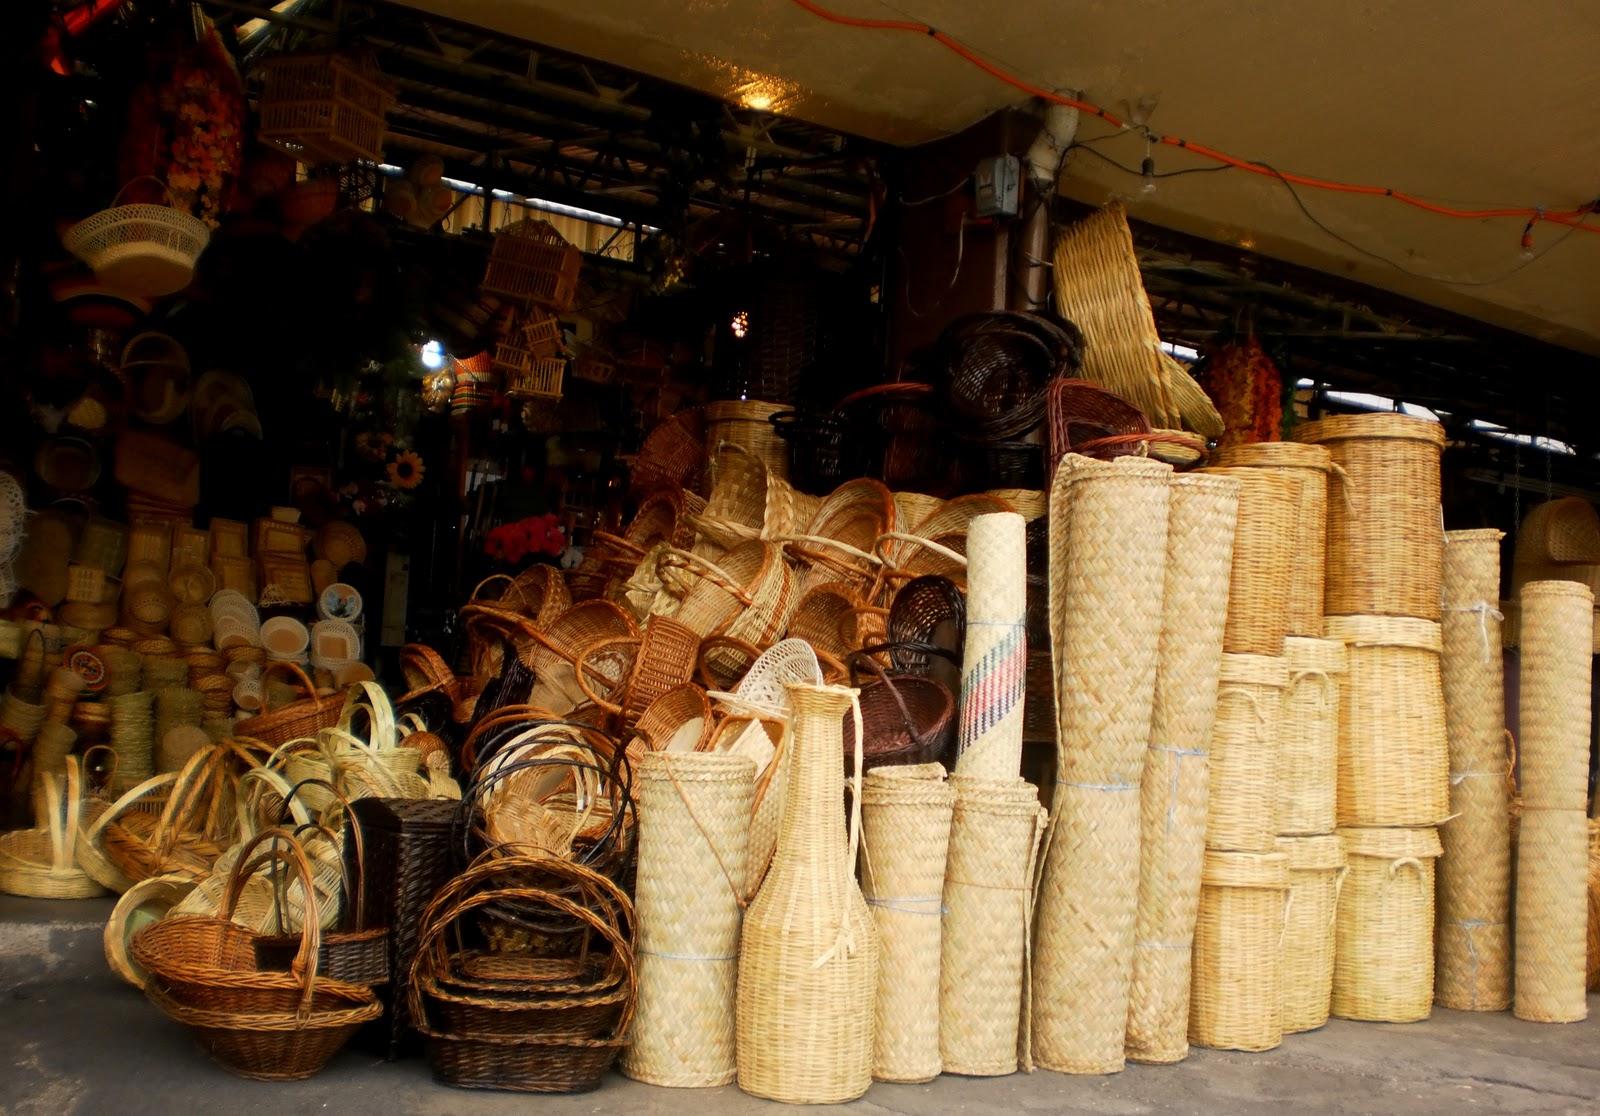 Arte cultura e historia la cester a mexicana - Cestos de palma ...